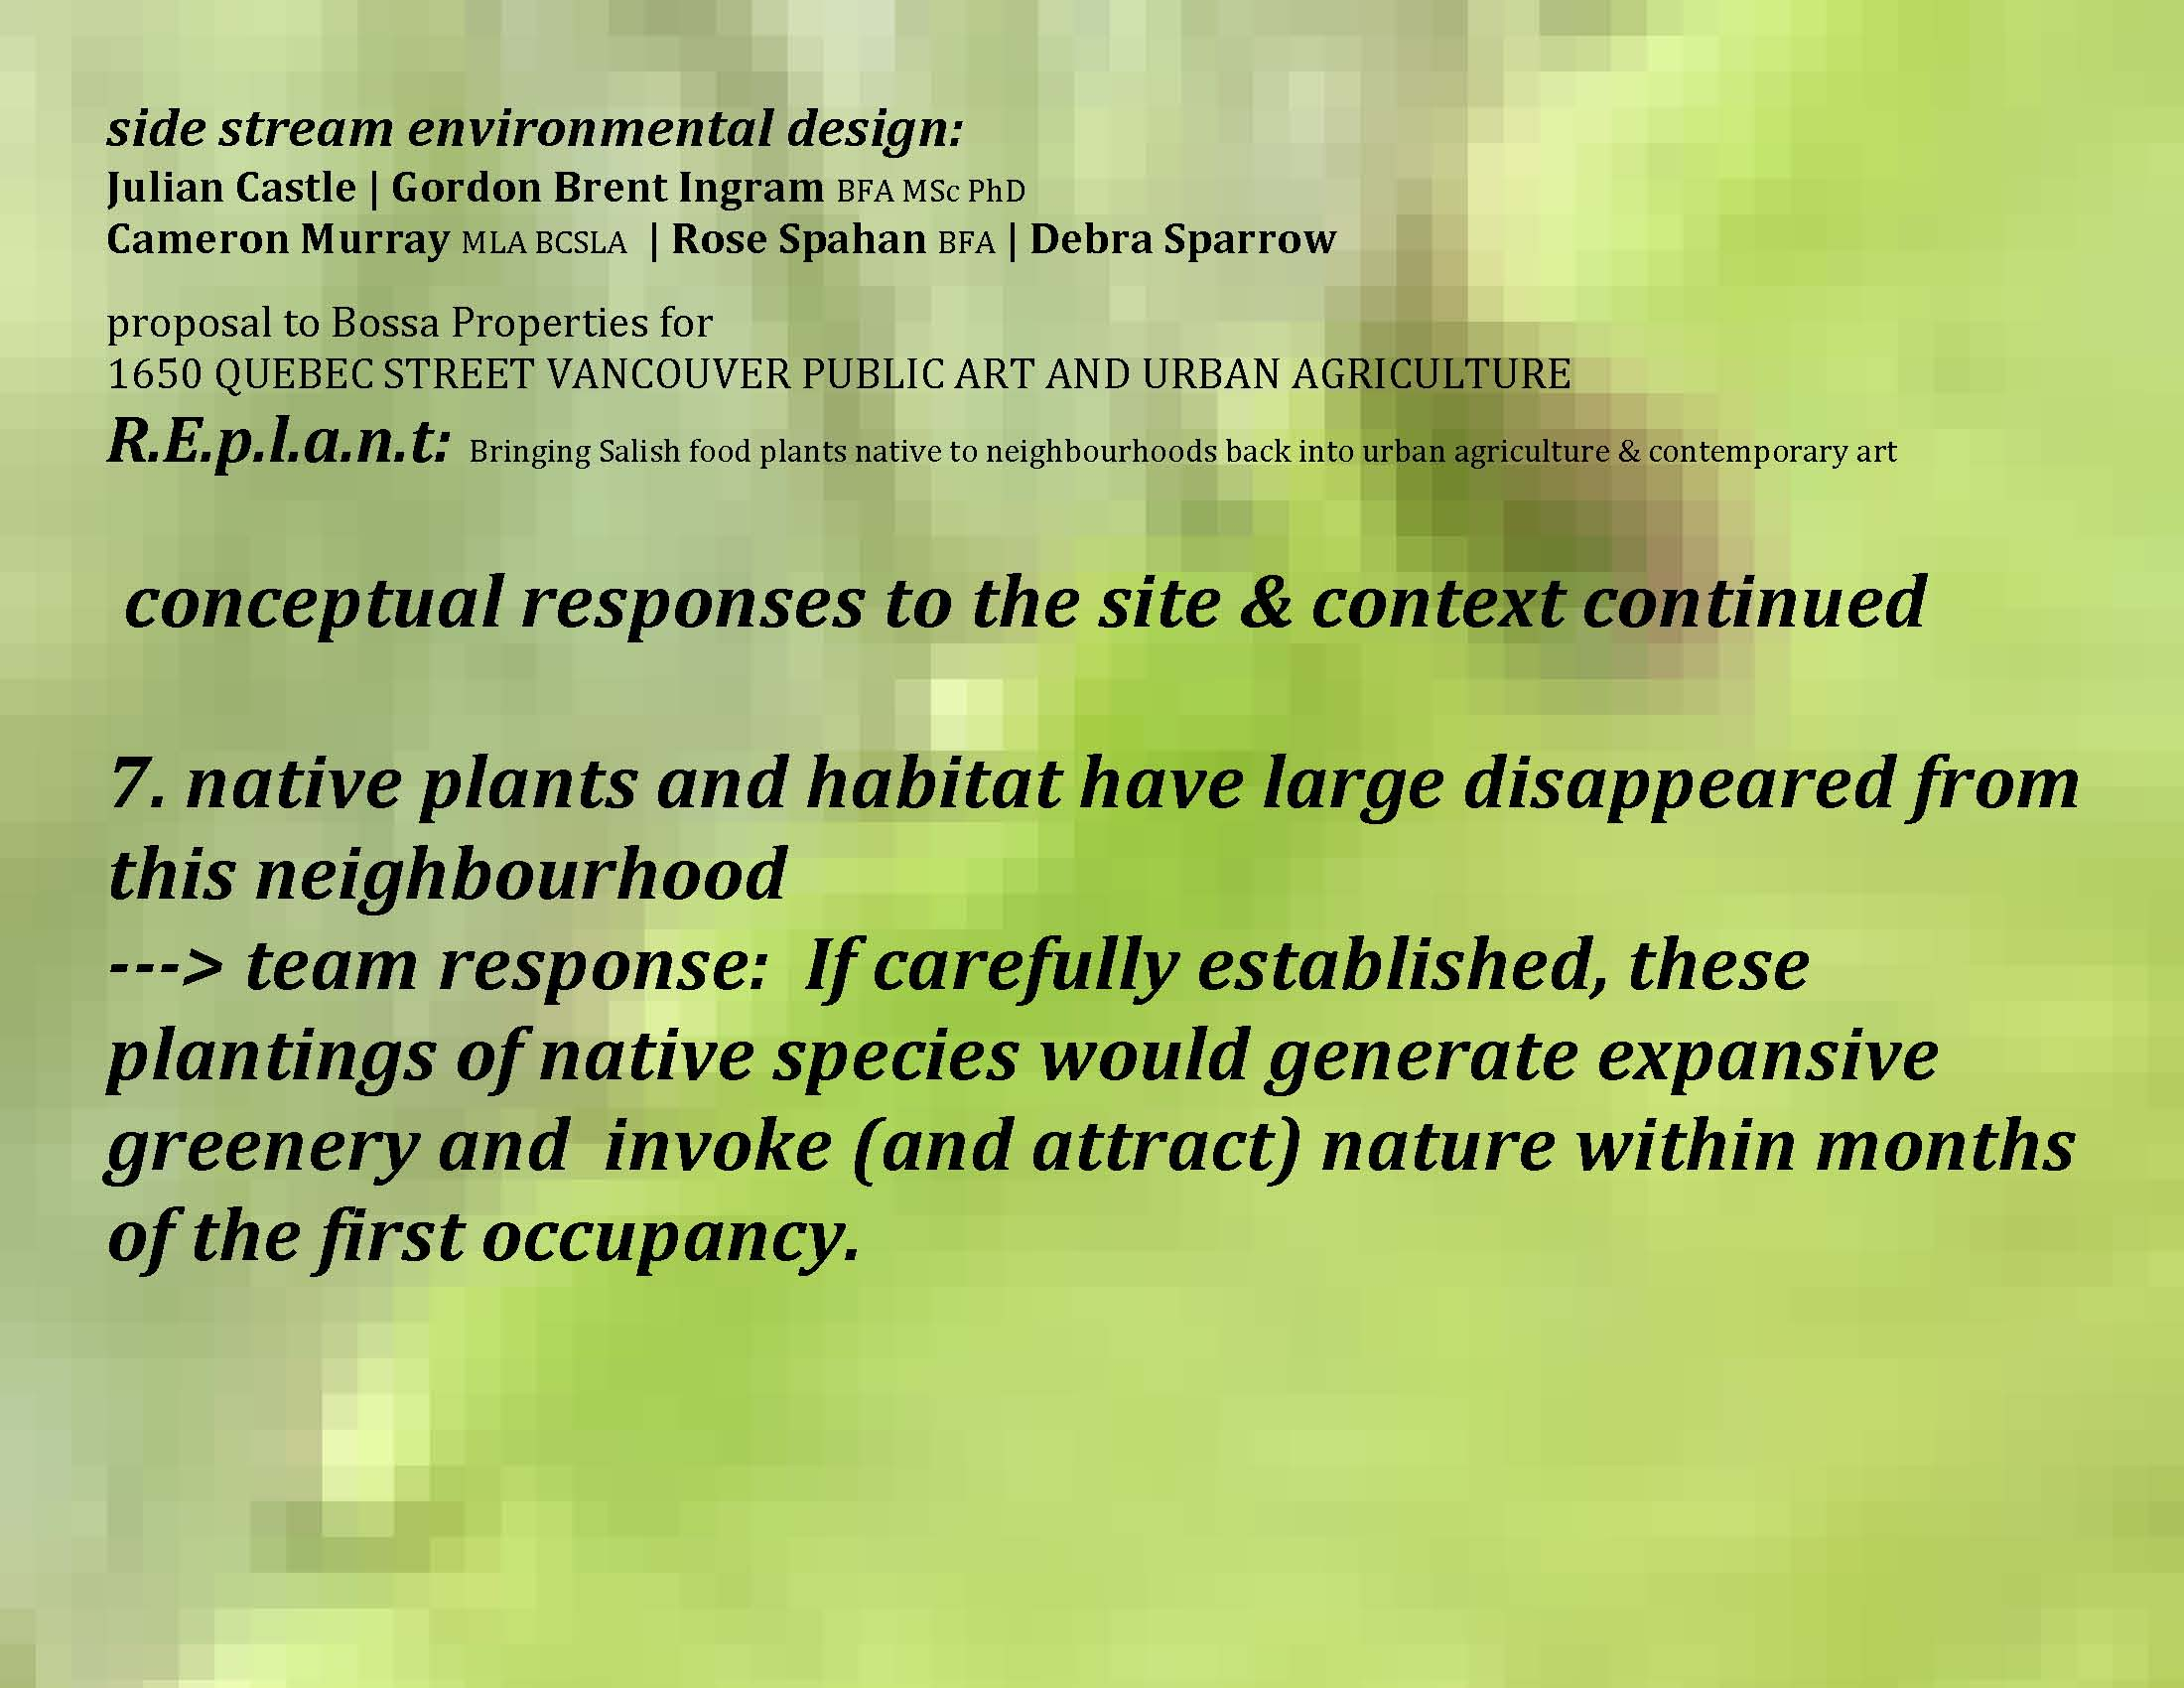 gordon brent brochu-ingram › environmental planning and design